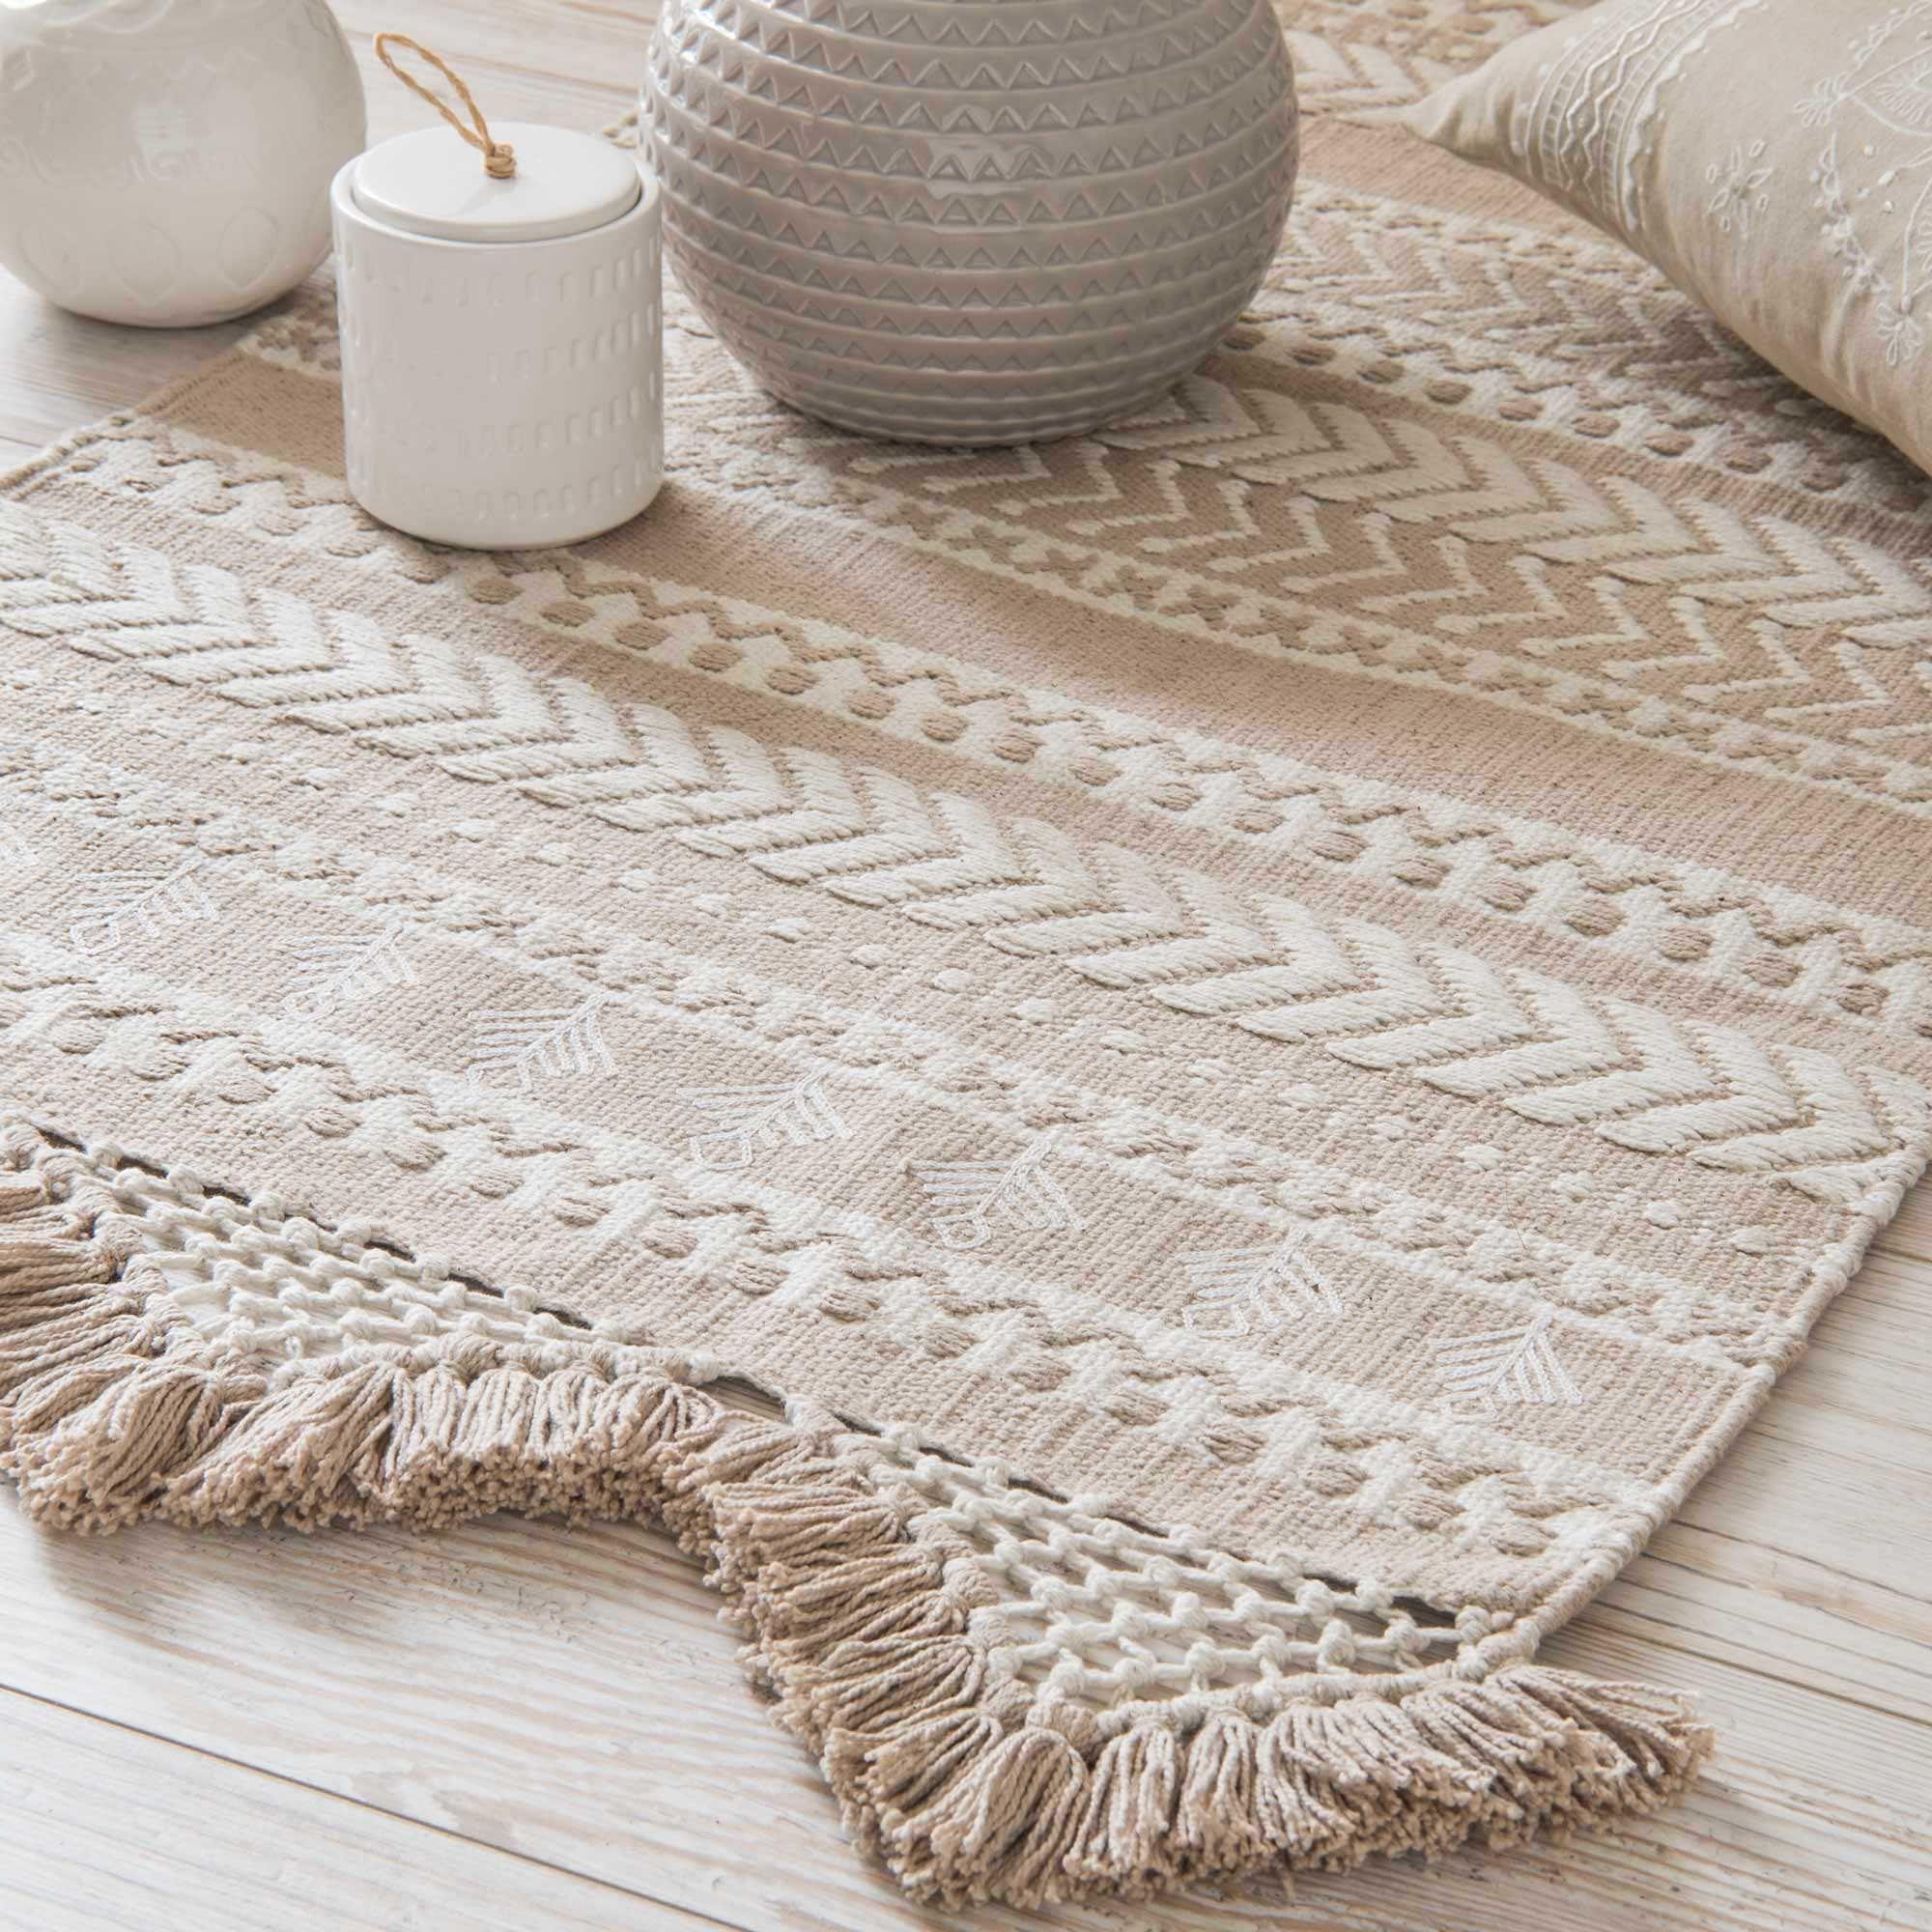 Textile En 2019 Boheme Tapis Coton Decoration Chambre Blanche